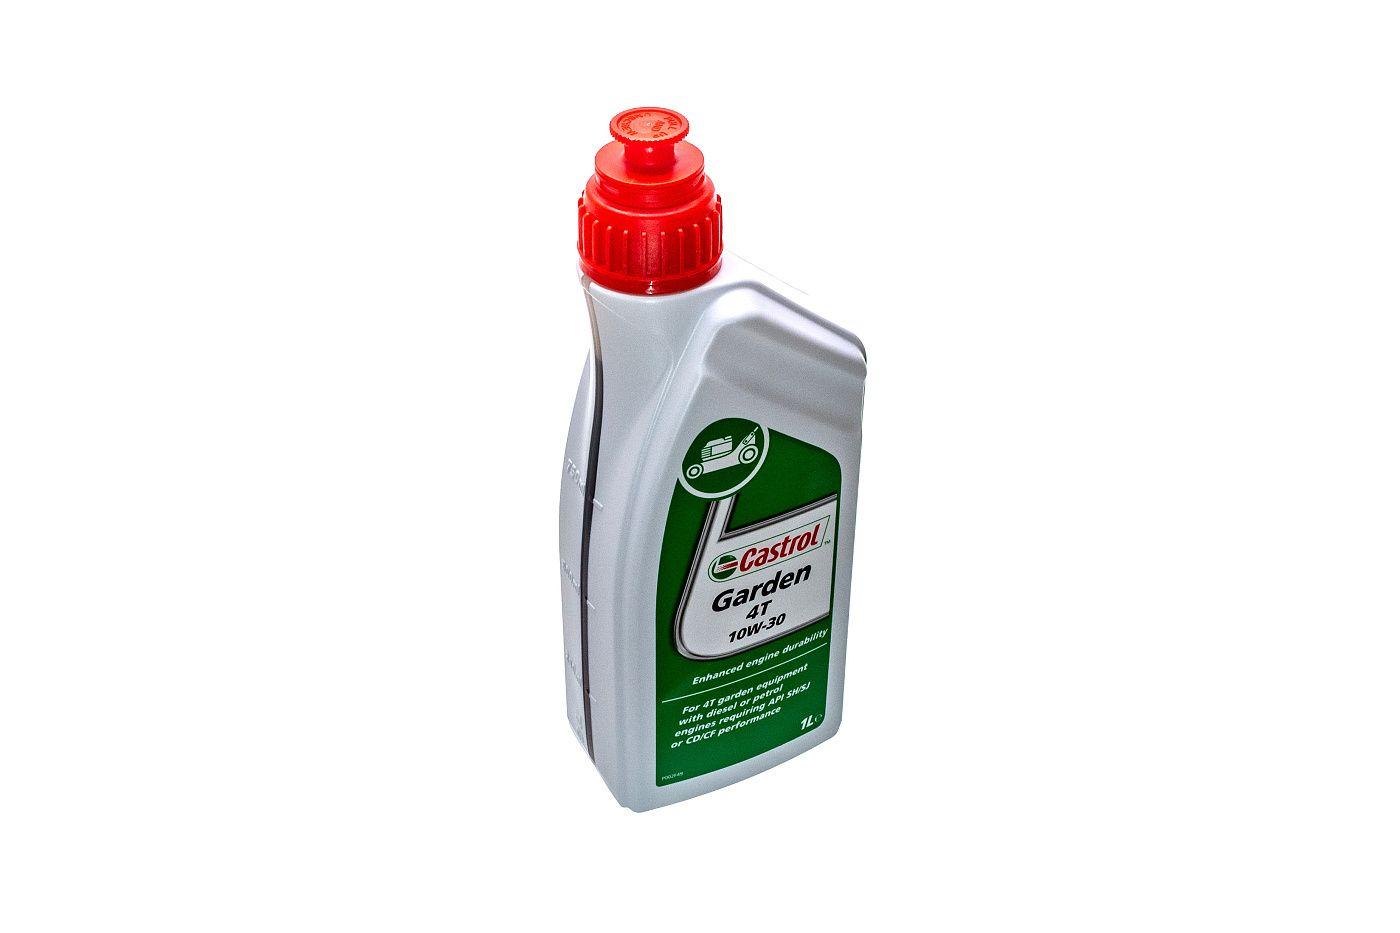 Motorový olej CASTROL Garden 4T 10W-30 - 1L (SAE 10W-30, API SH, SJ / CD, CF)